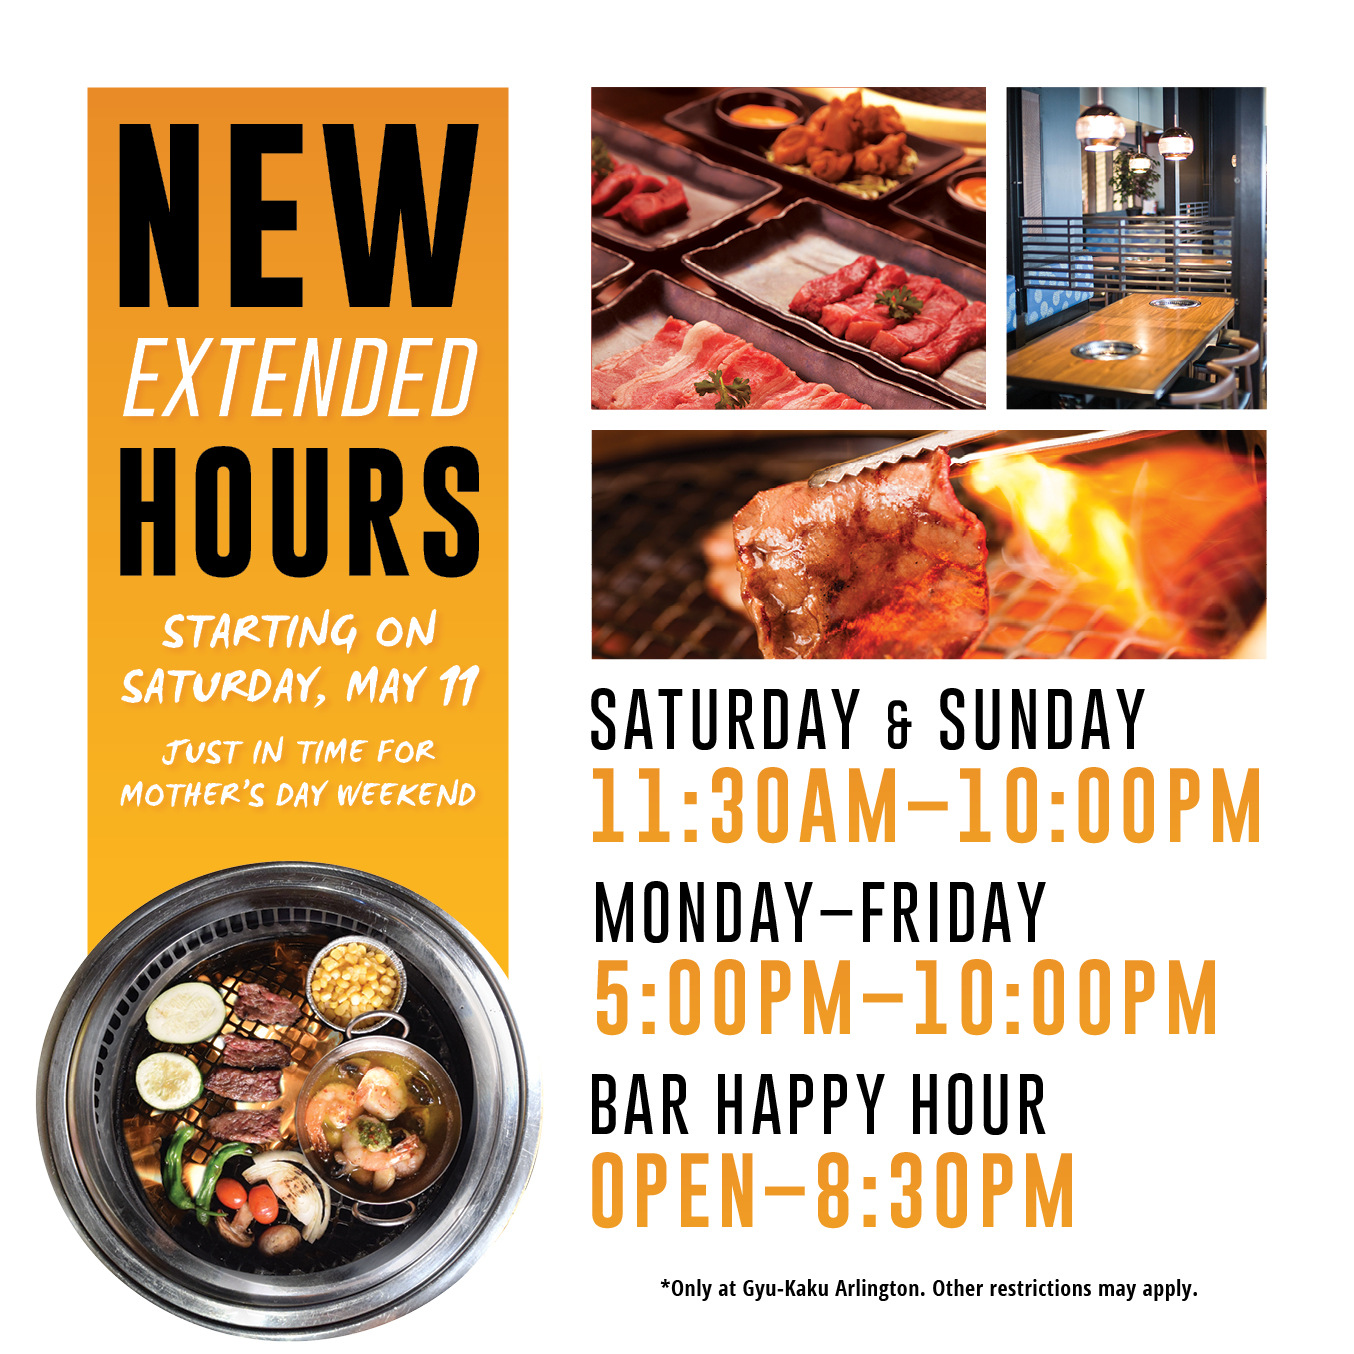 New extended hours for Gyu-Kaku Arlington